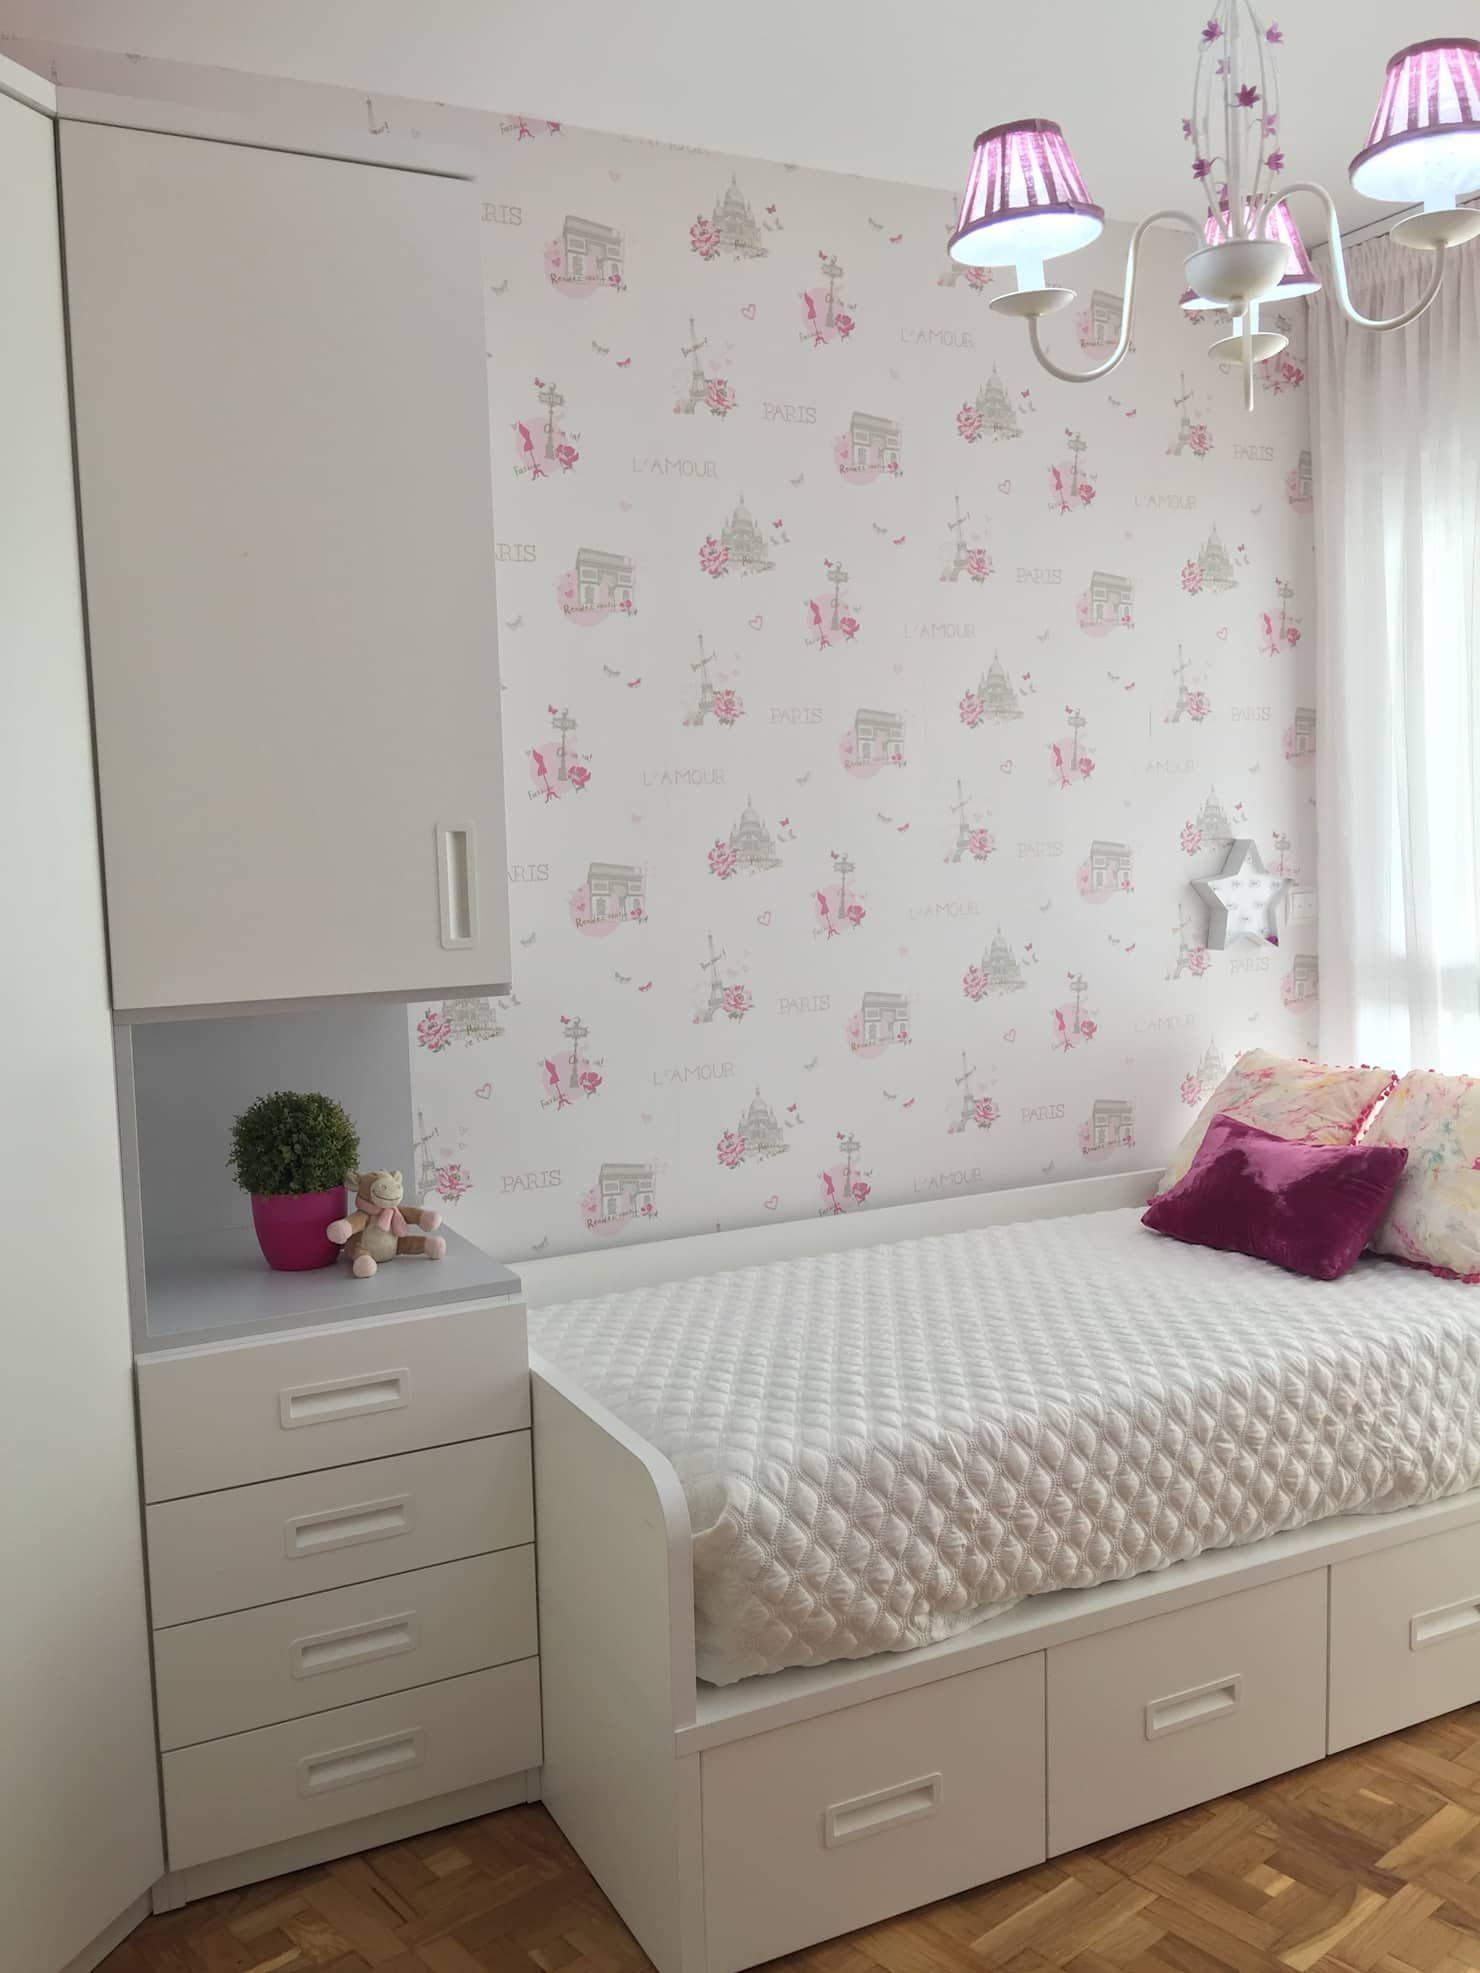 Dormitorio rosa para niña: dormitorios infantiles de estilo de noelia villalba, moderno